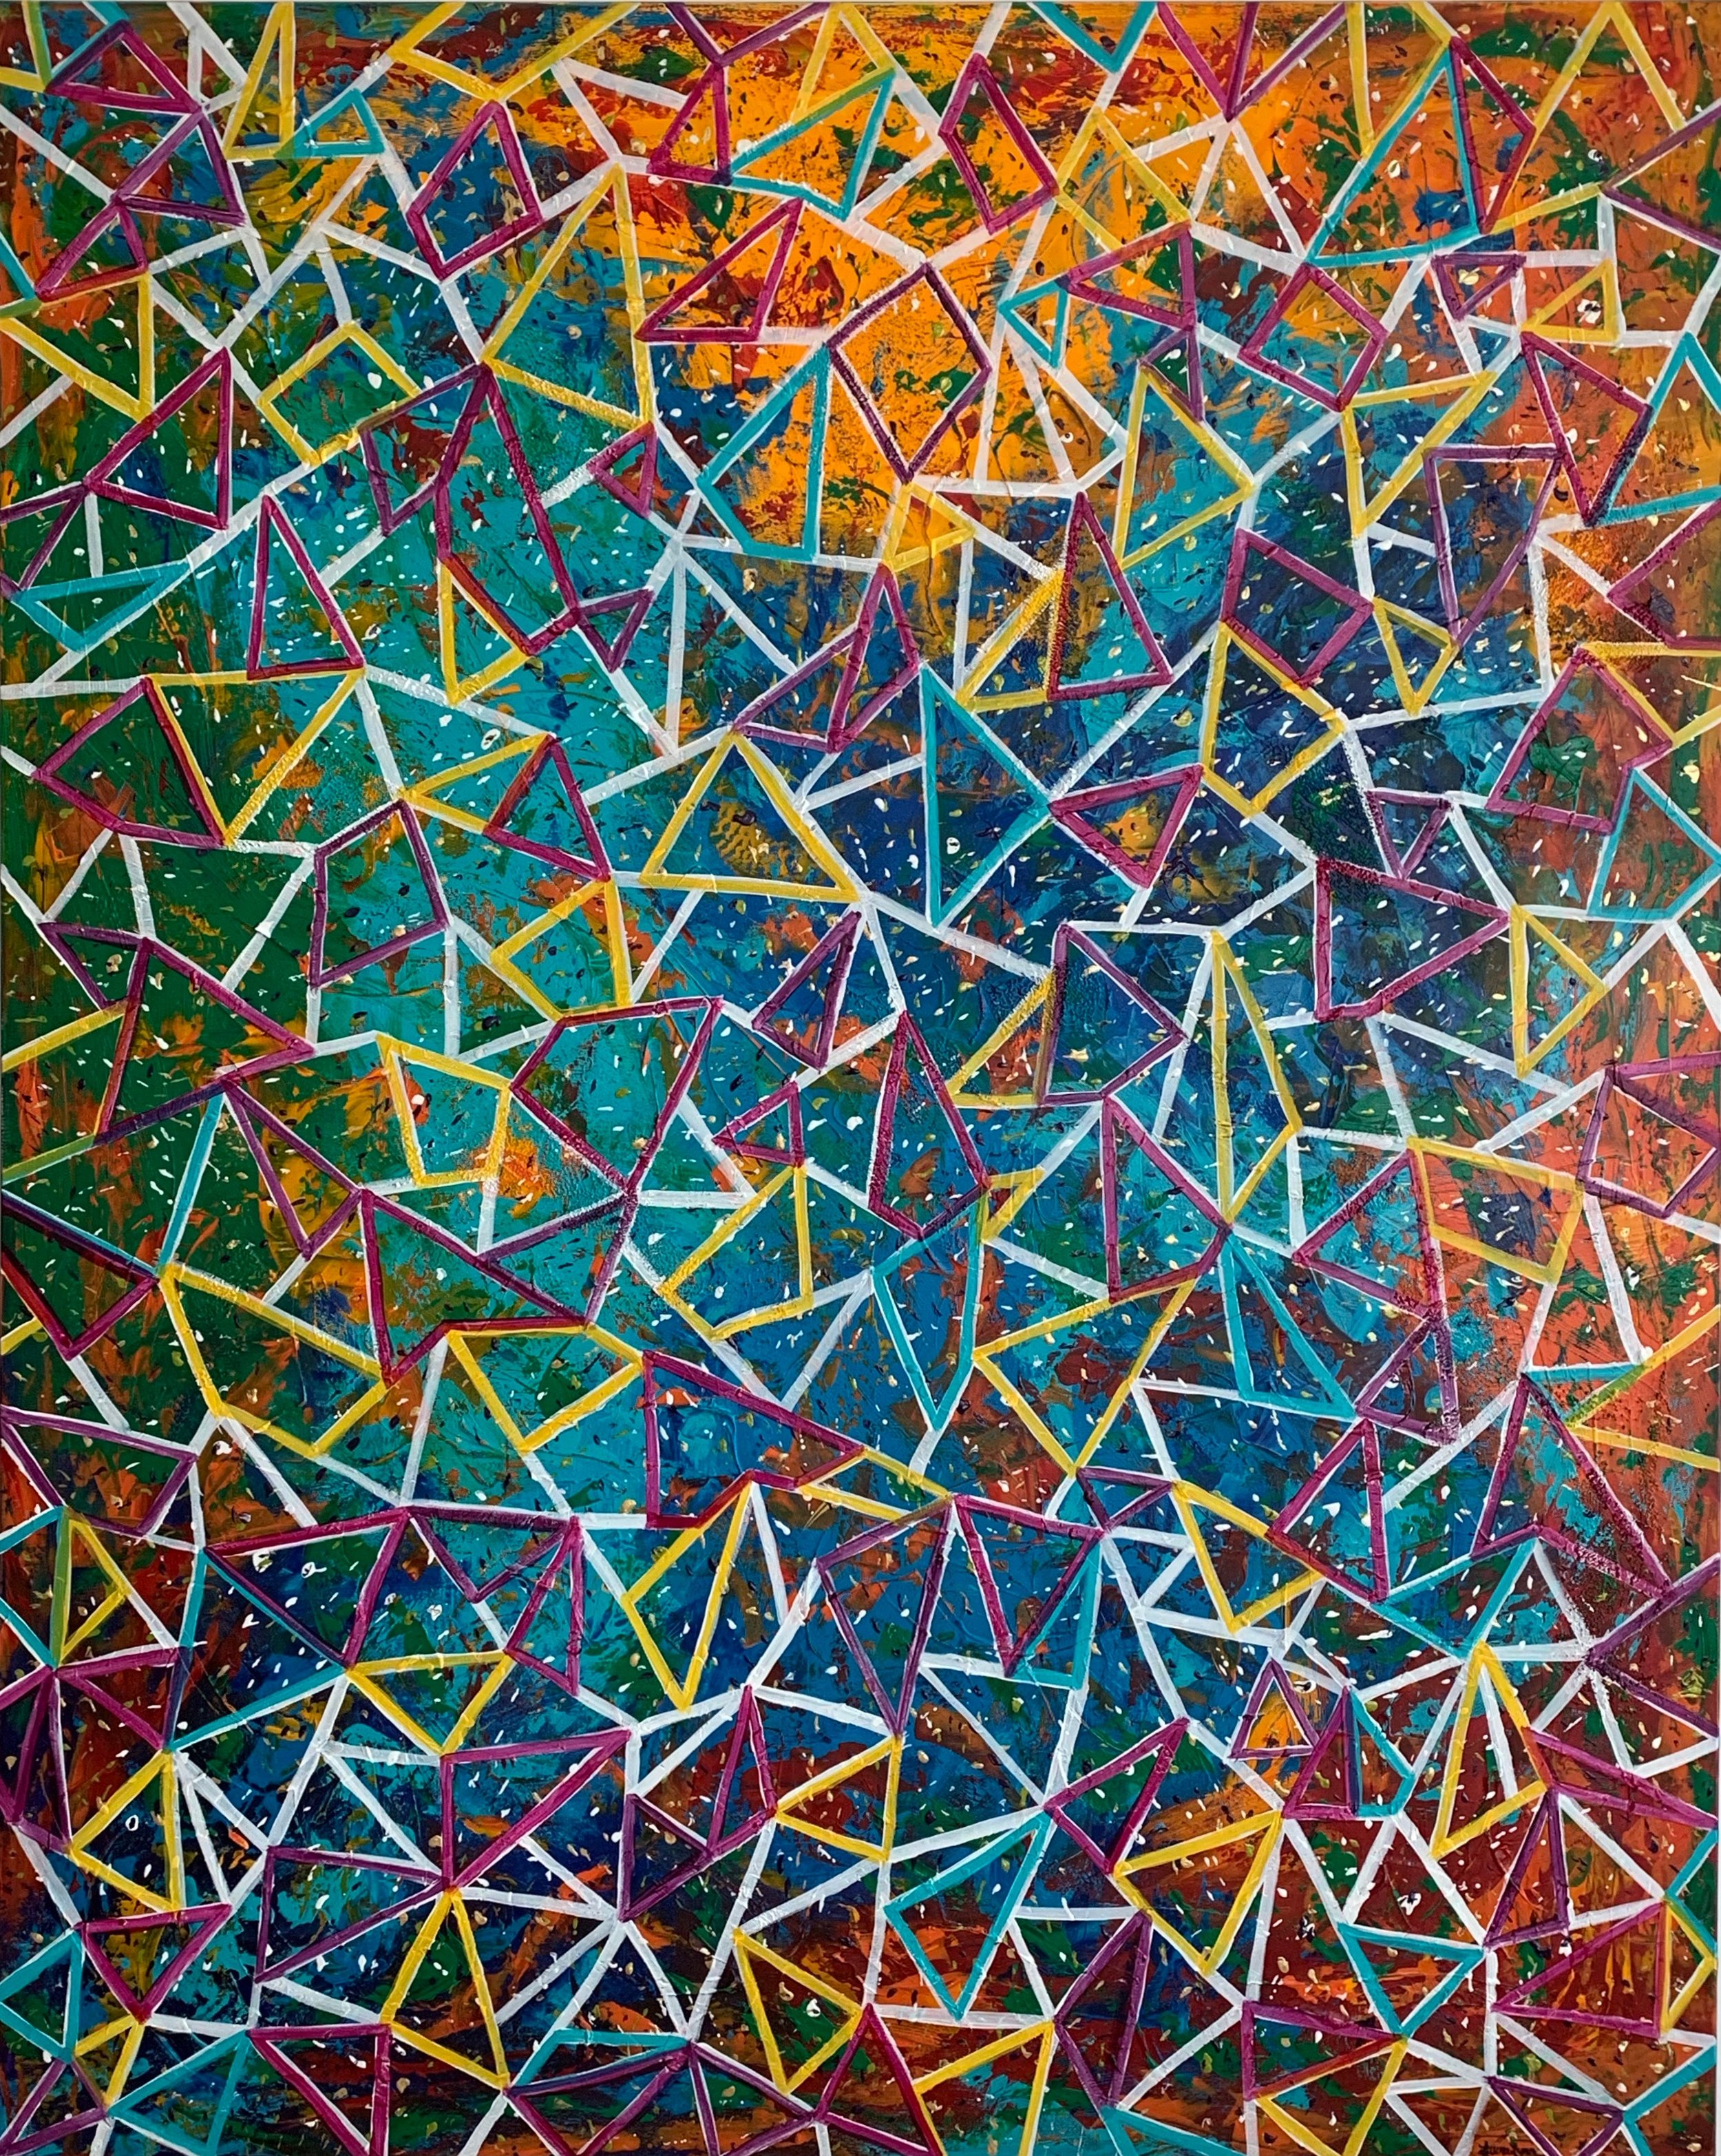 Kaleidoscope - 48 x 60